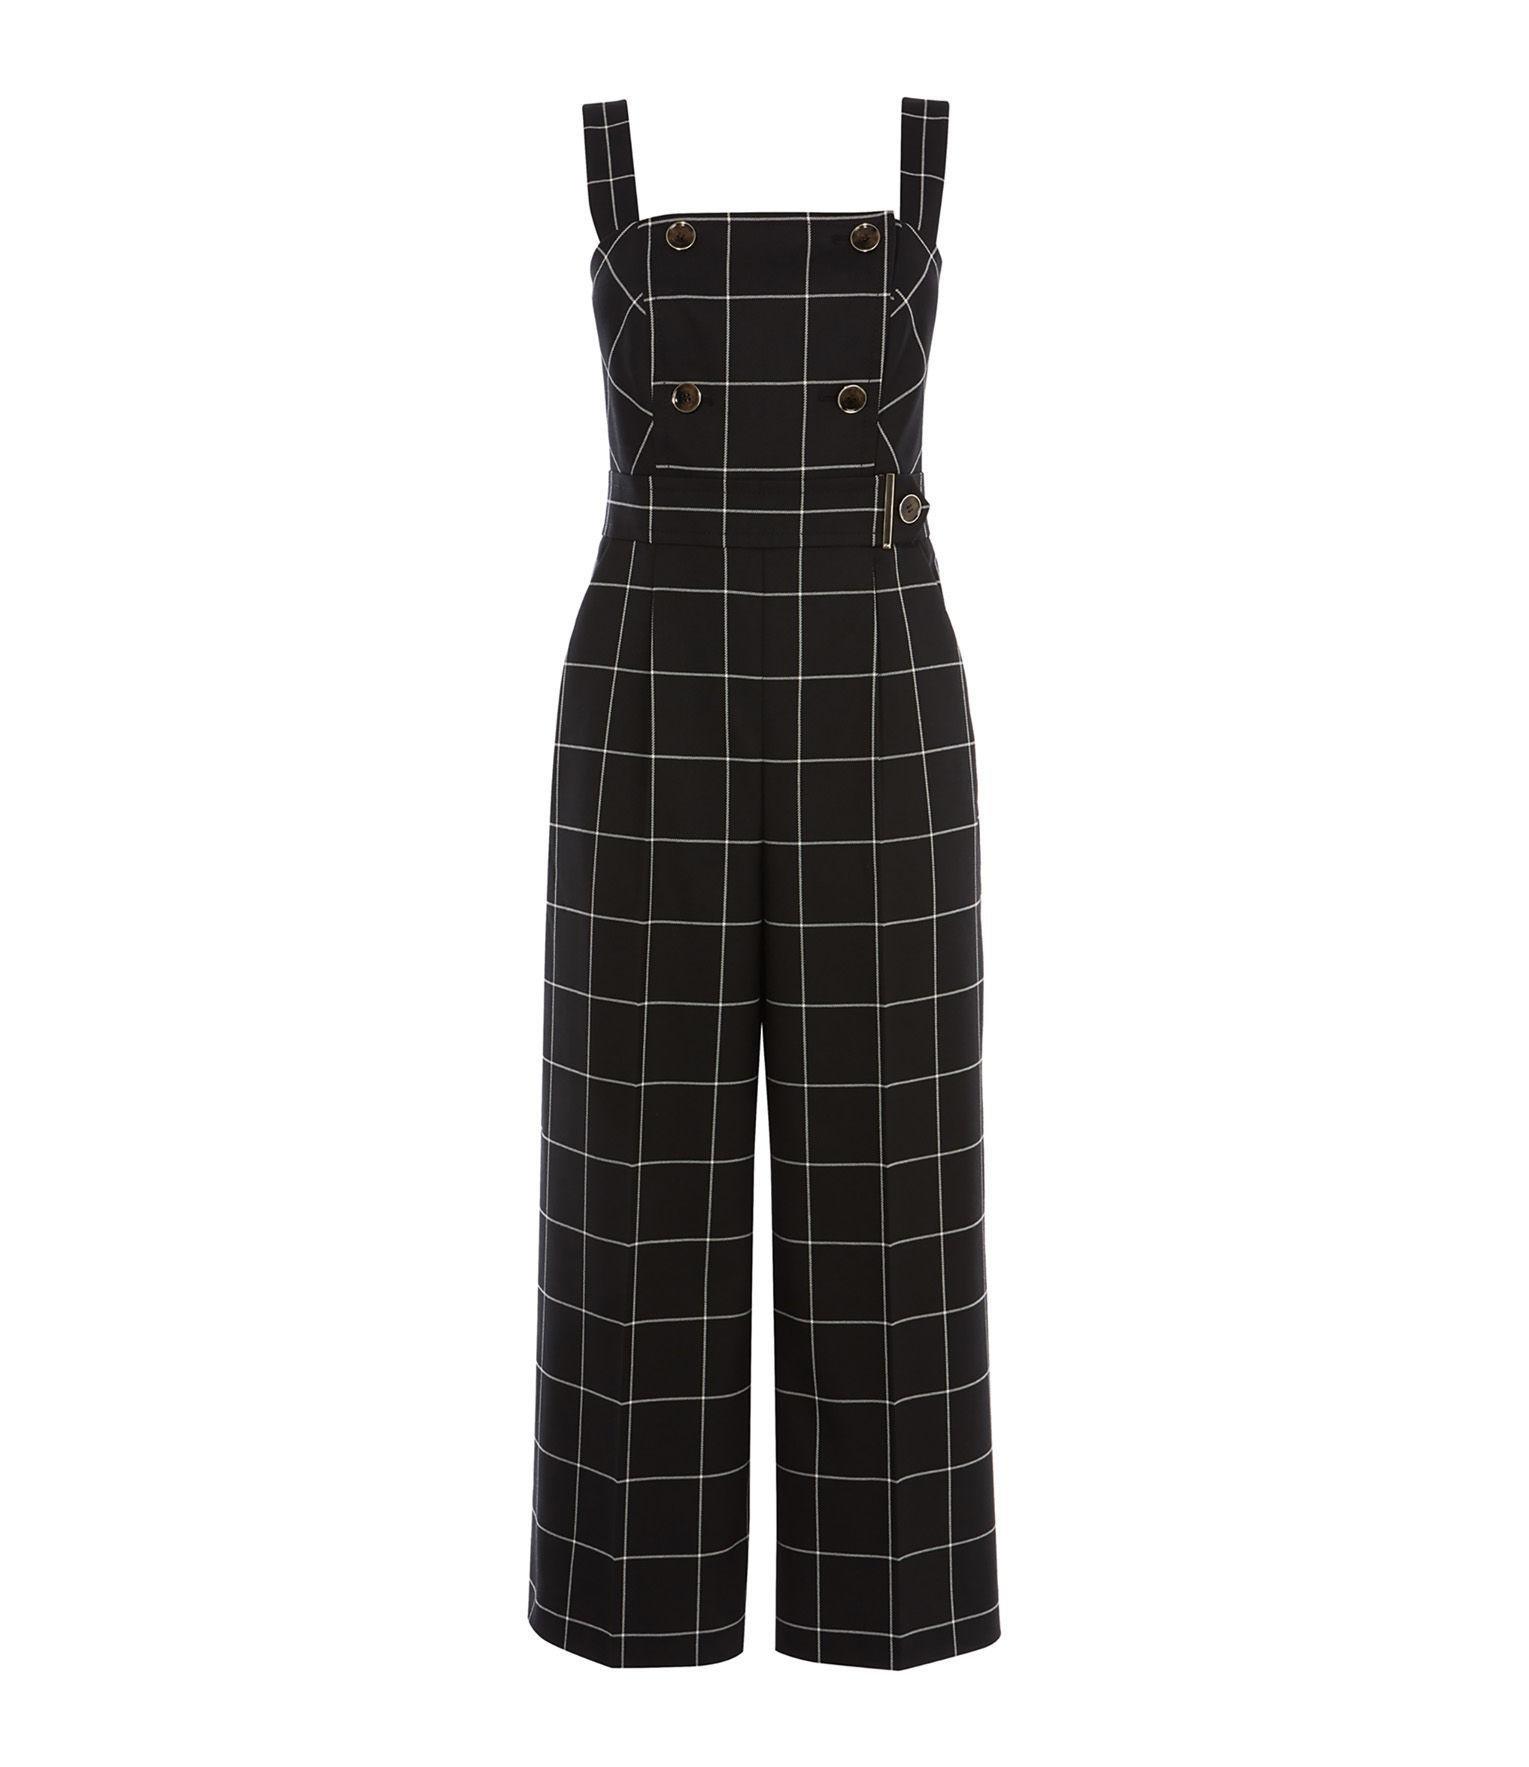 7834fb3b78e Karen Millen Check Culotte Jumpsuit in Black - Lyst